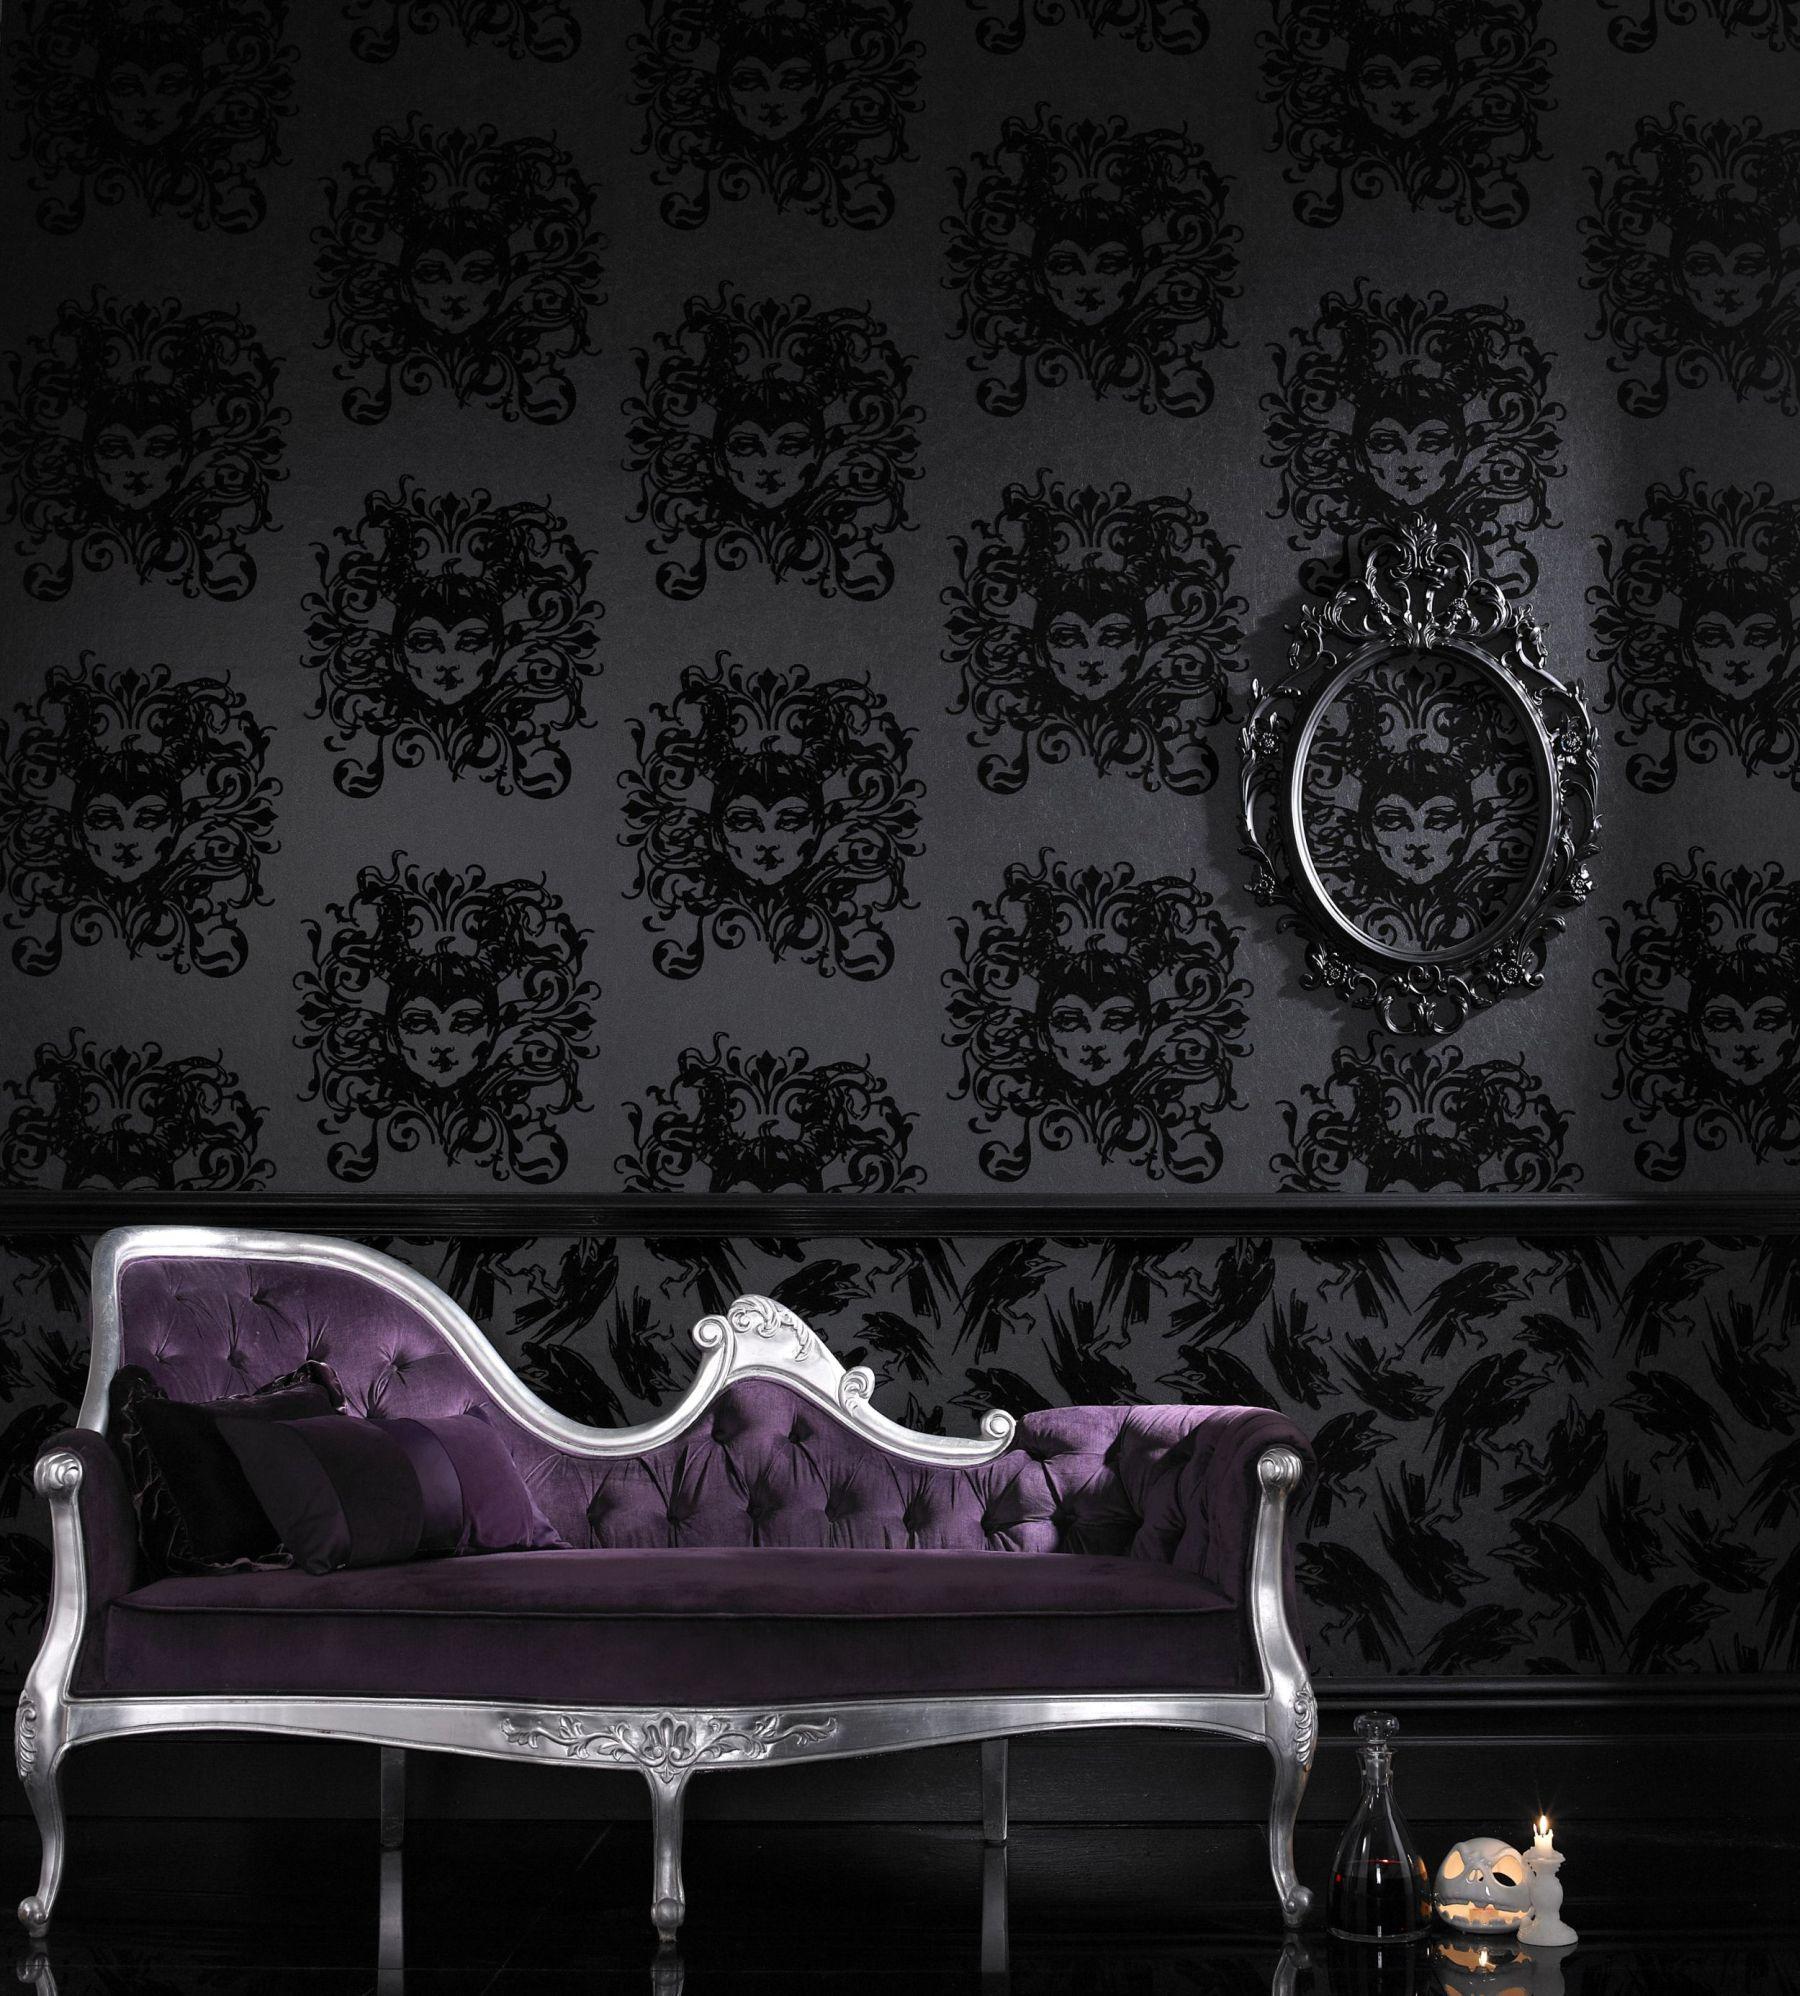 Gothic Design Wallpaper : Bat and poppy wallpaper wallpapersafari